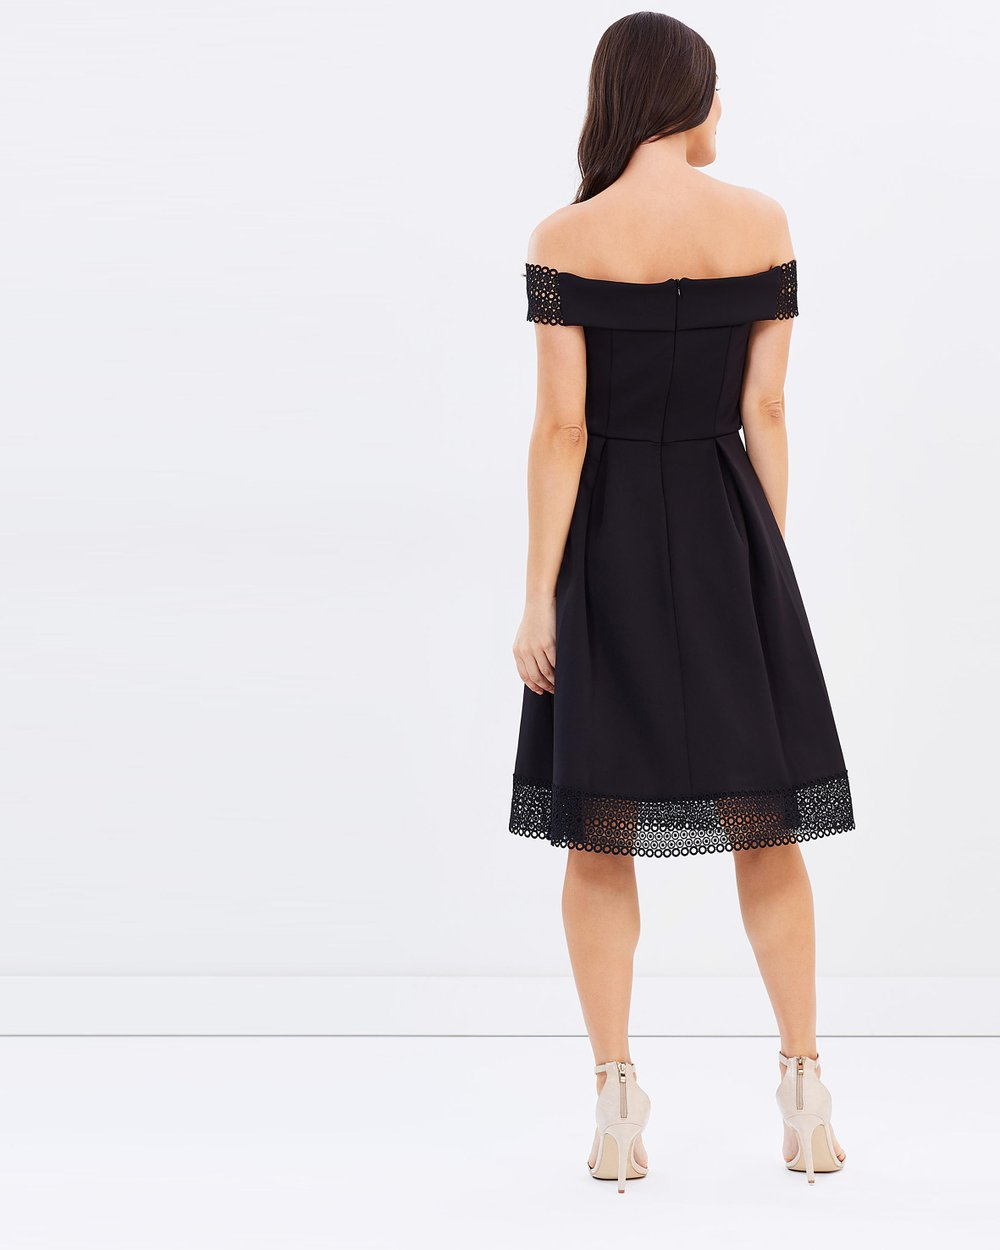 Dotty p black dress cocktail